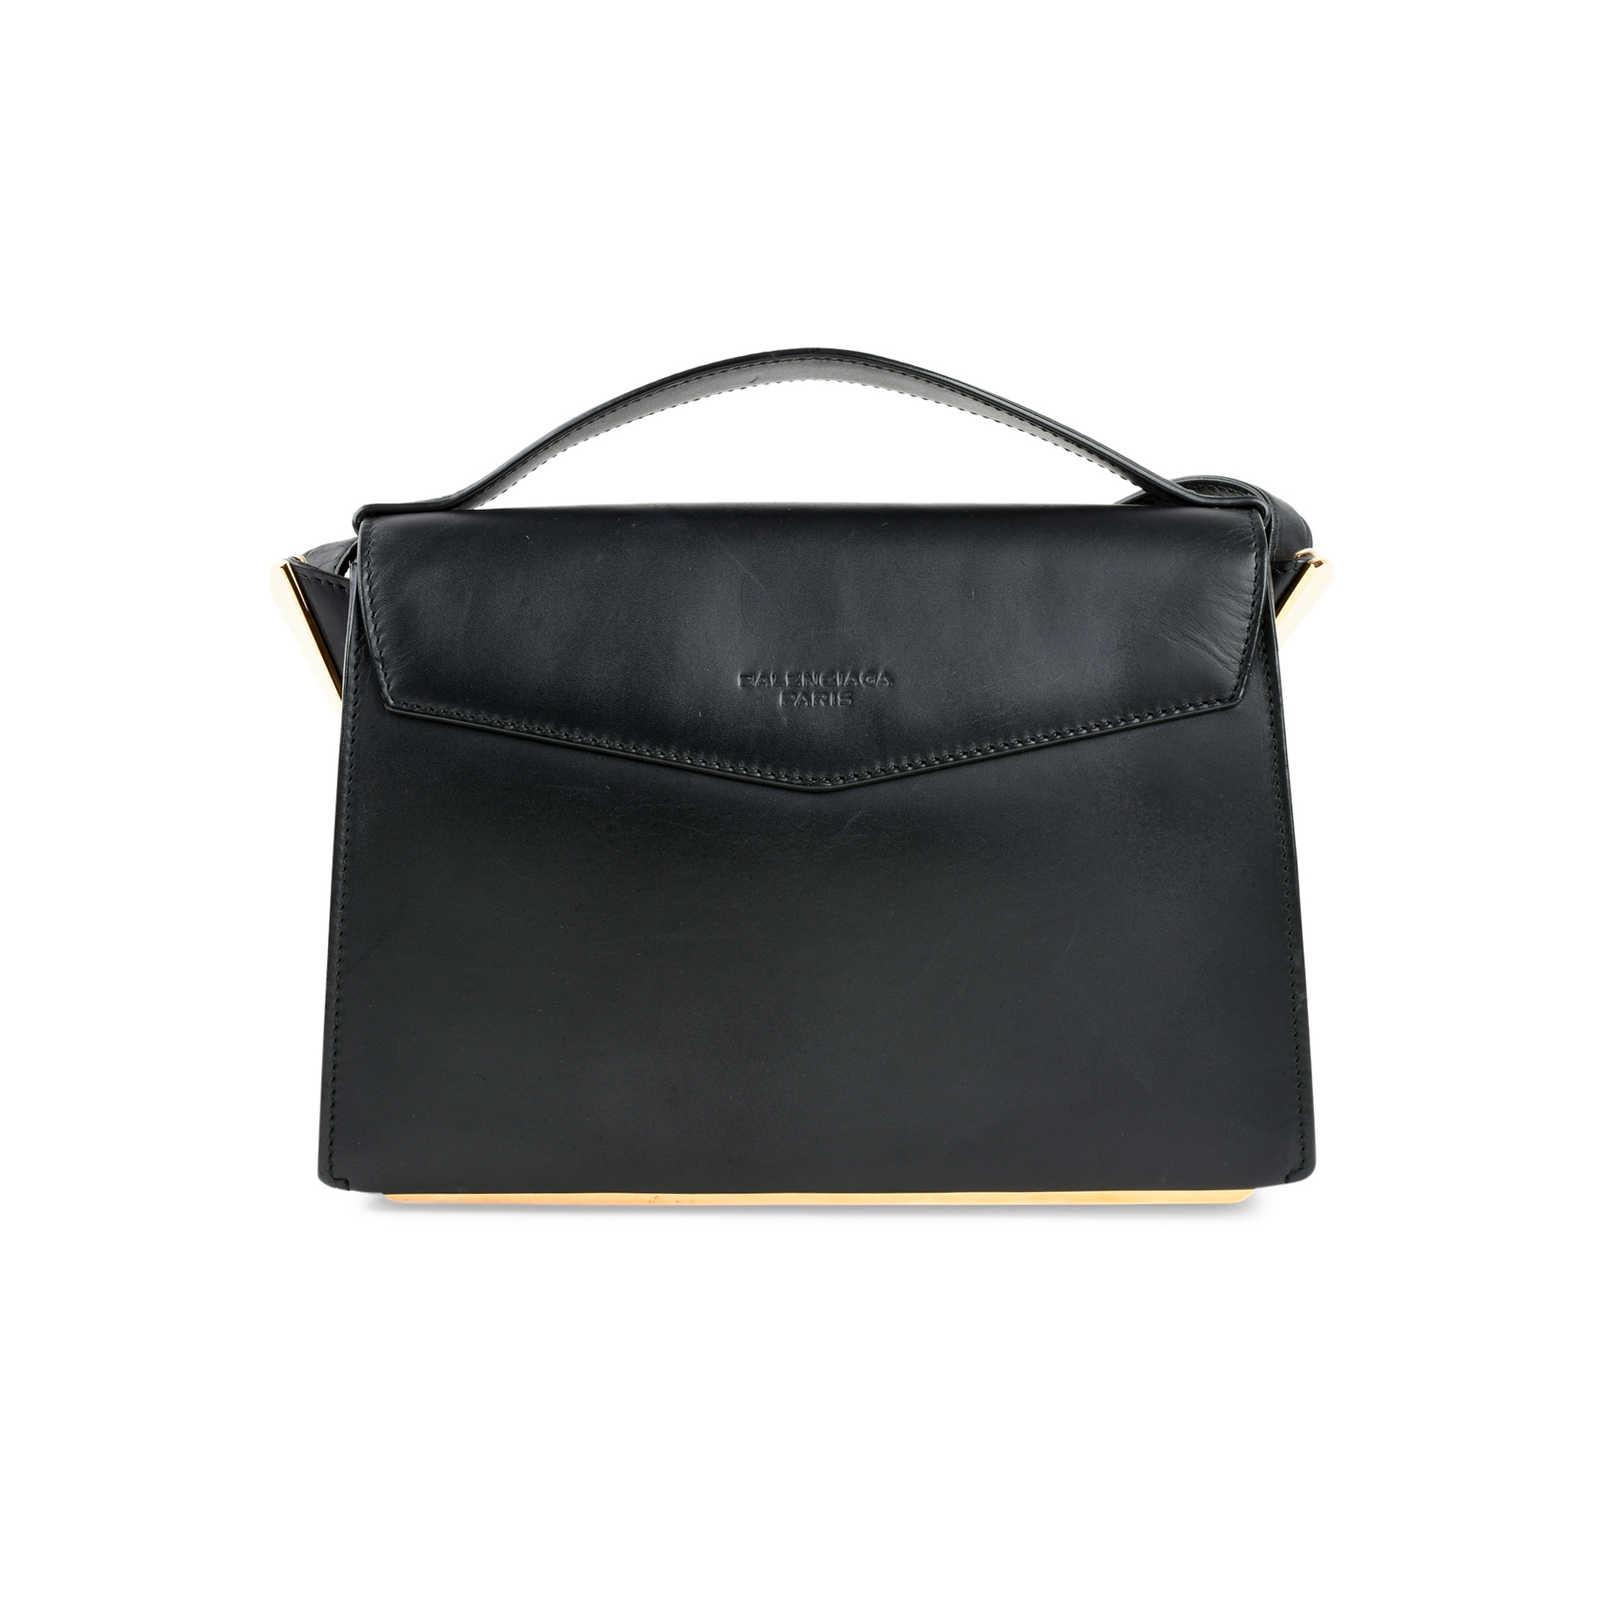 140e63668 ... Authentic Second Hand Balenciaga Tube-Clasp Crossbody Bag  (PSS-466-00004) ...